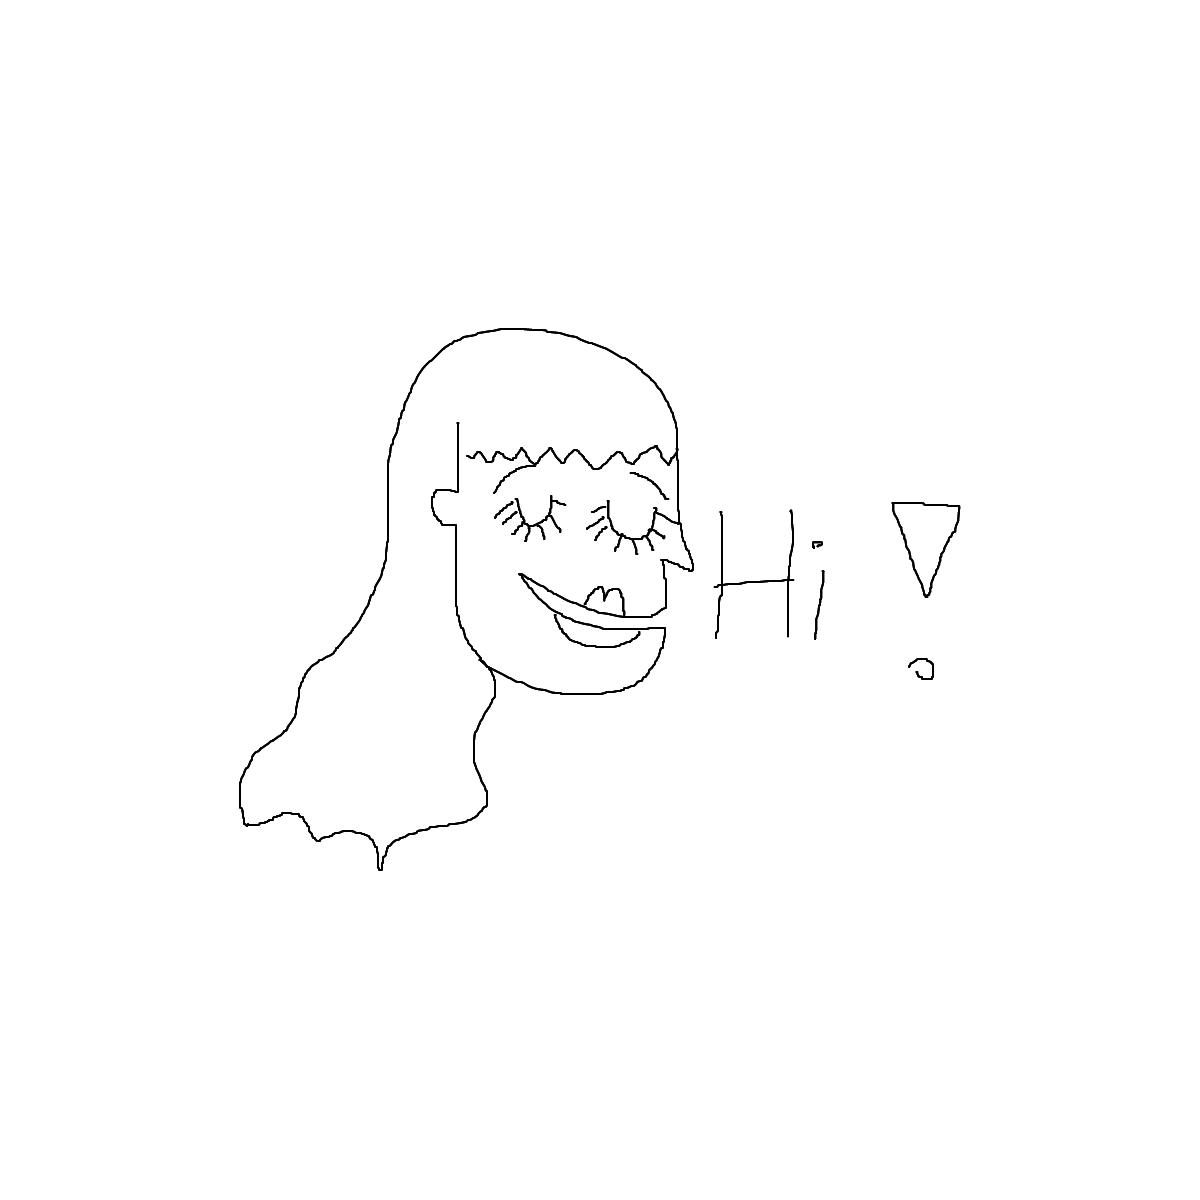 BAAAM drawing#1615 lat:53.6954650878906250lng: 17.5613250732421880